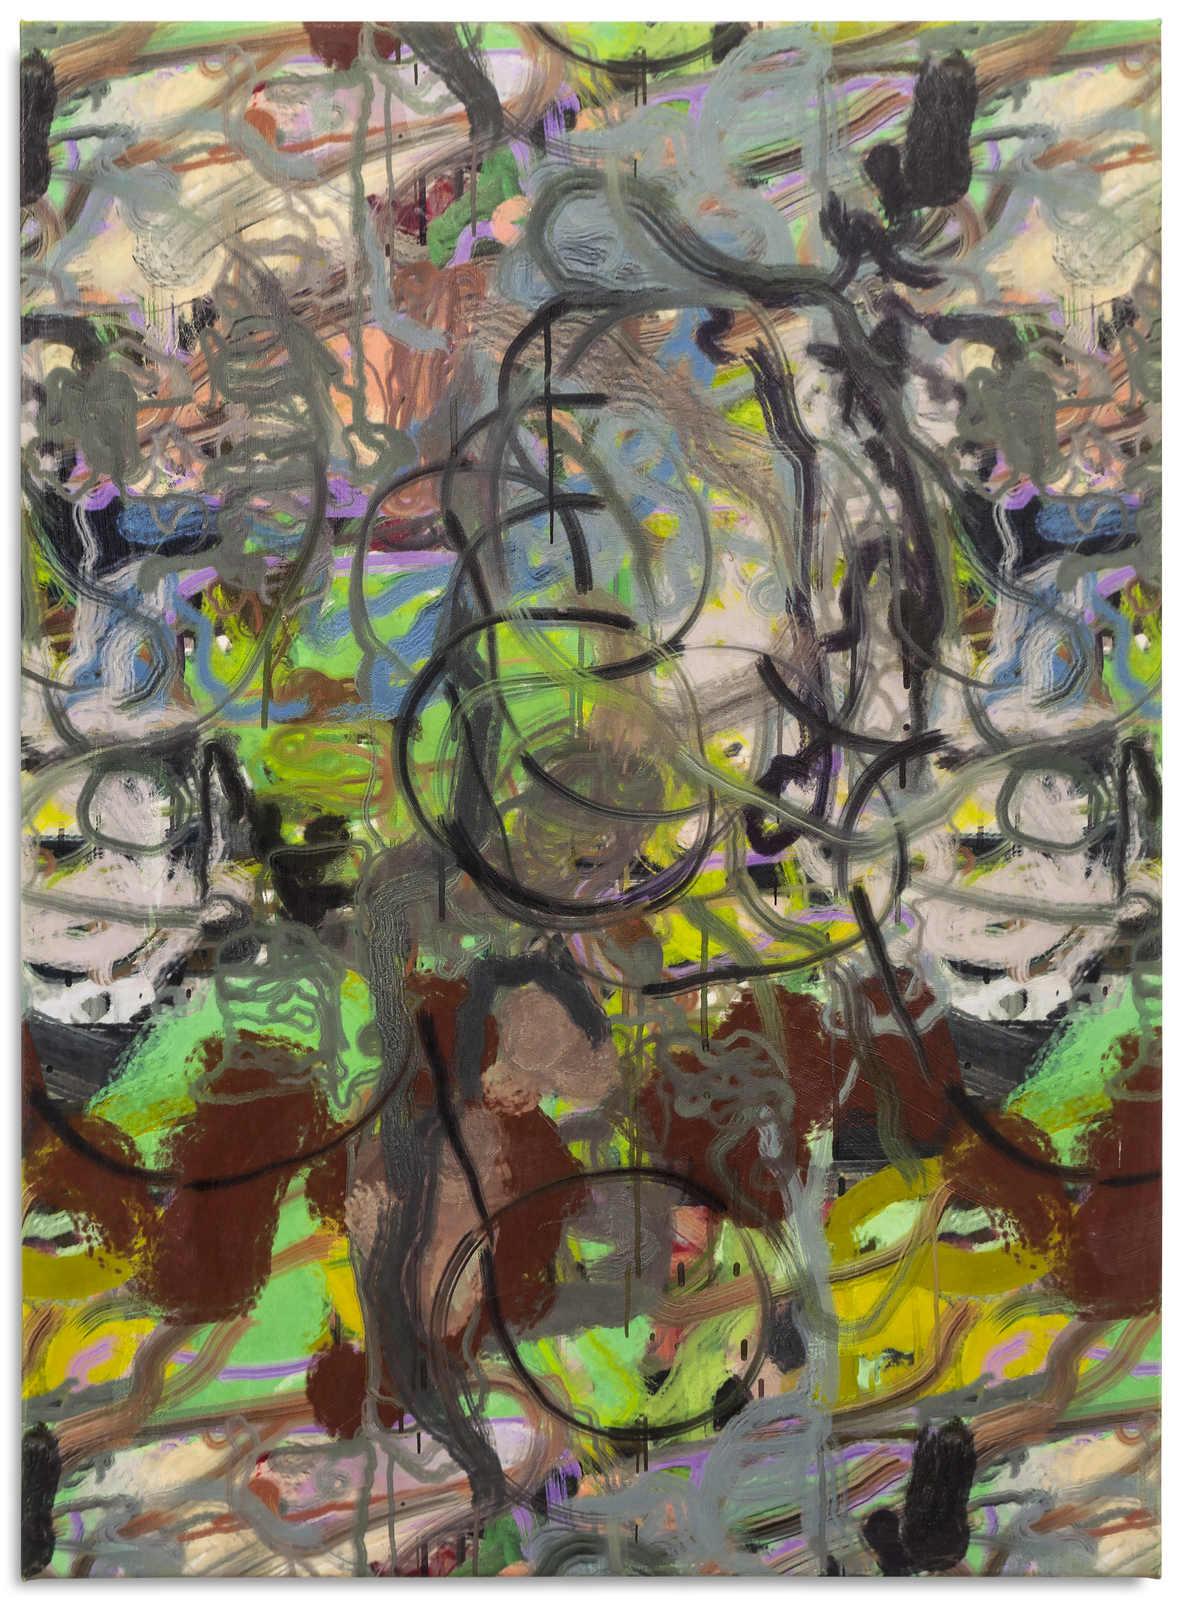 Versteeg_For Steadman_Algorithmically generated image printed on canvas, Rhoplex_34x25_2016